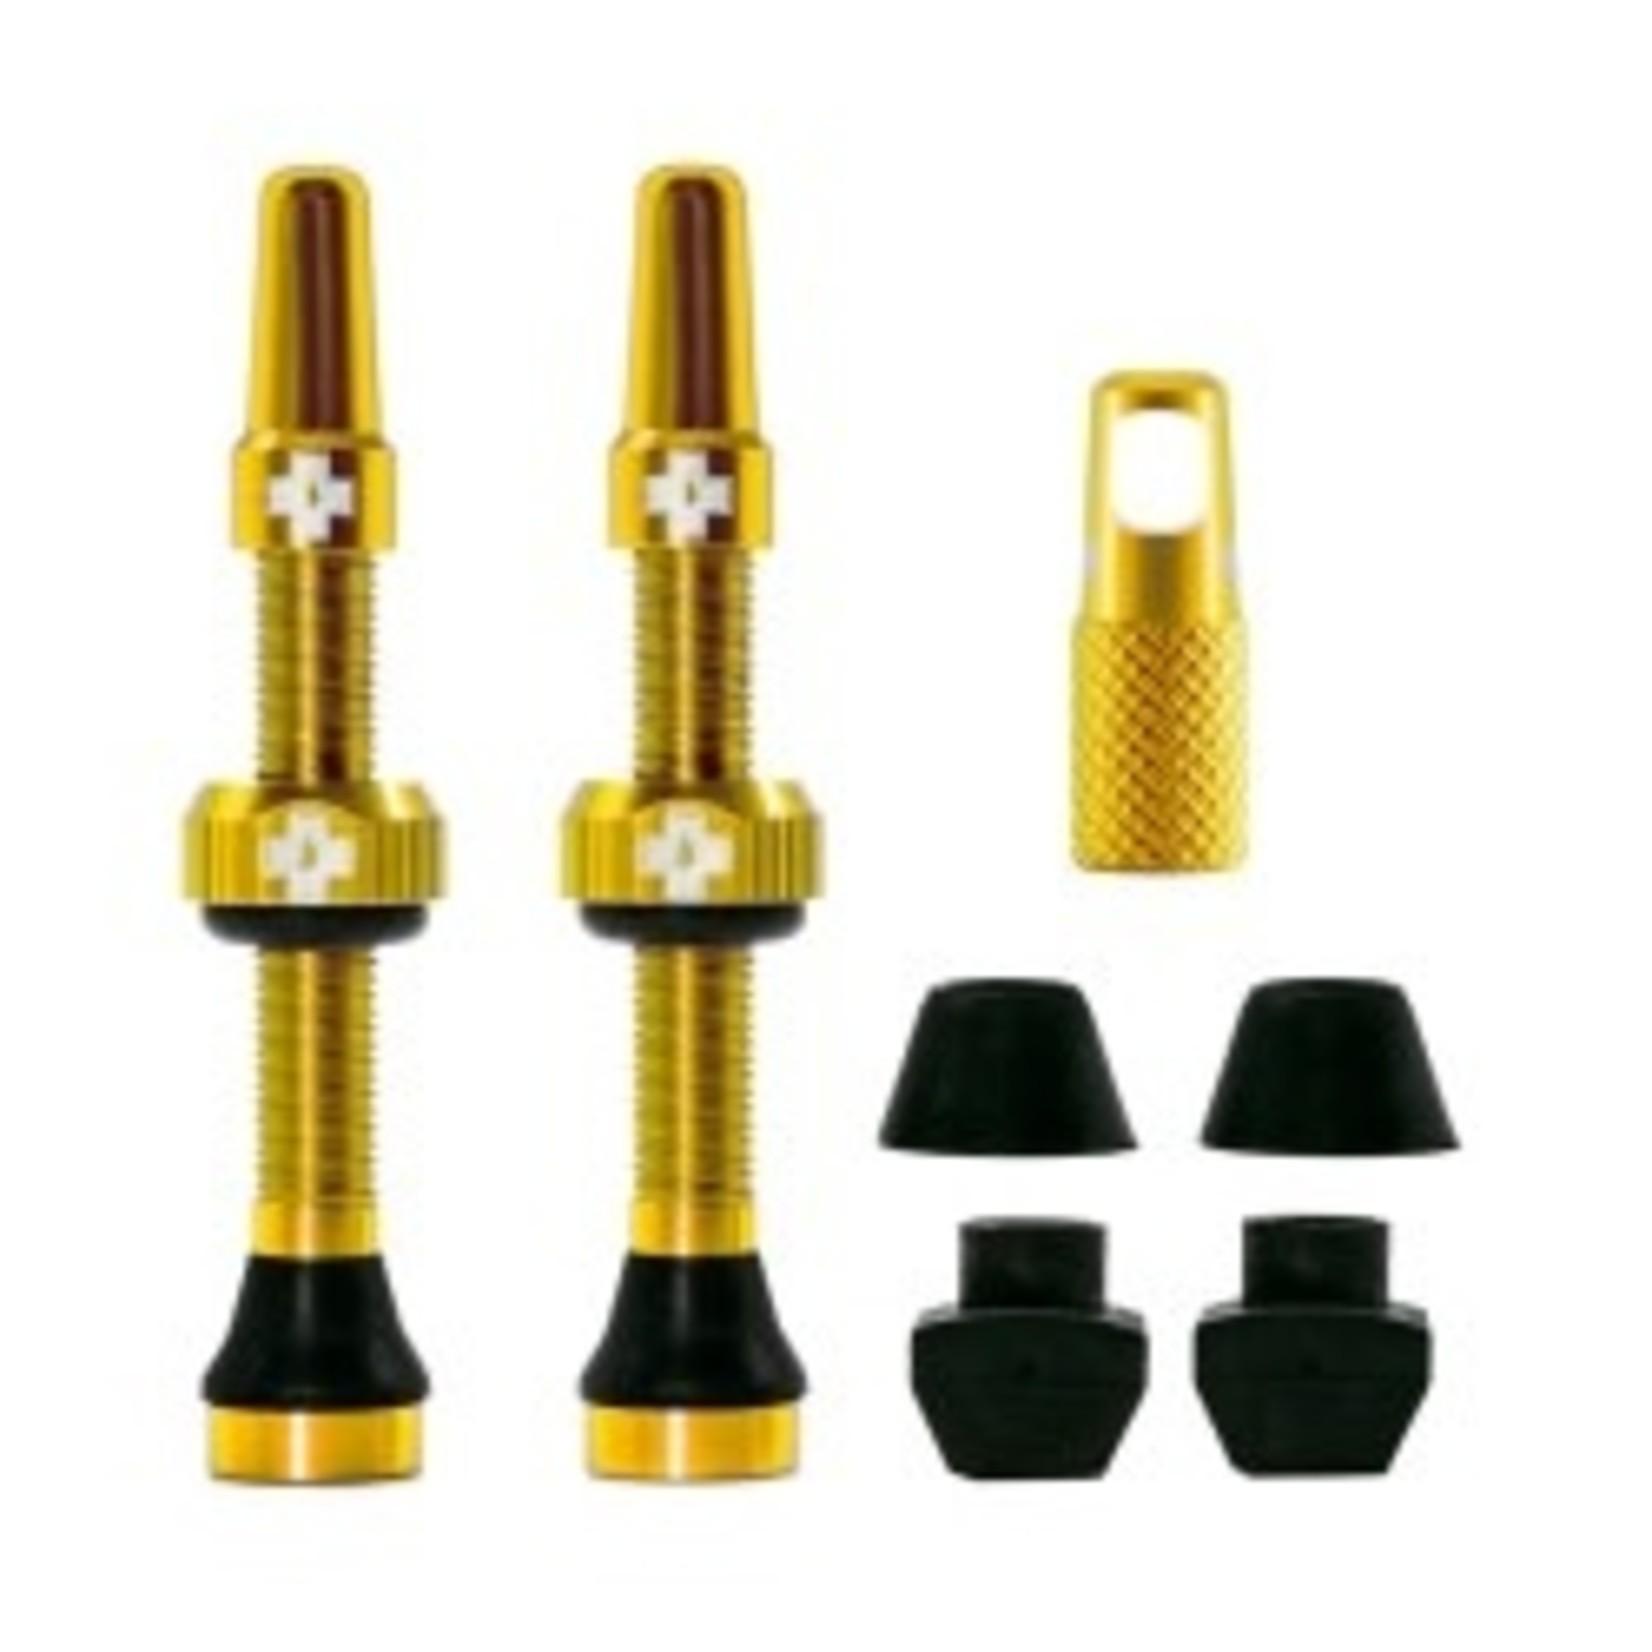 Muc-Off Muc-Off kit valvola tubeless 44mm - giallo